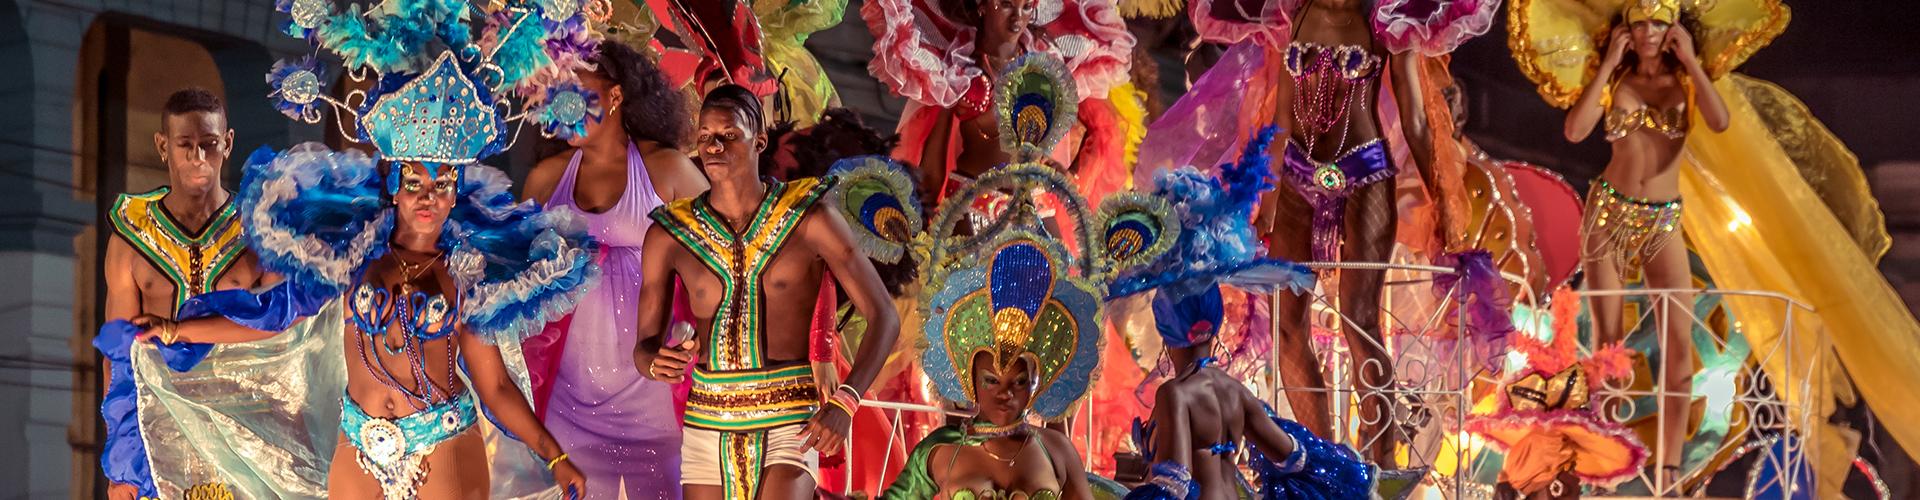 Real Santiago de Cuba Carnival